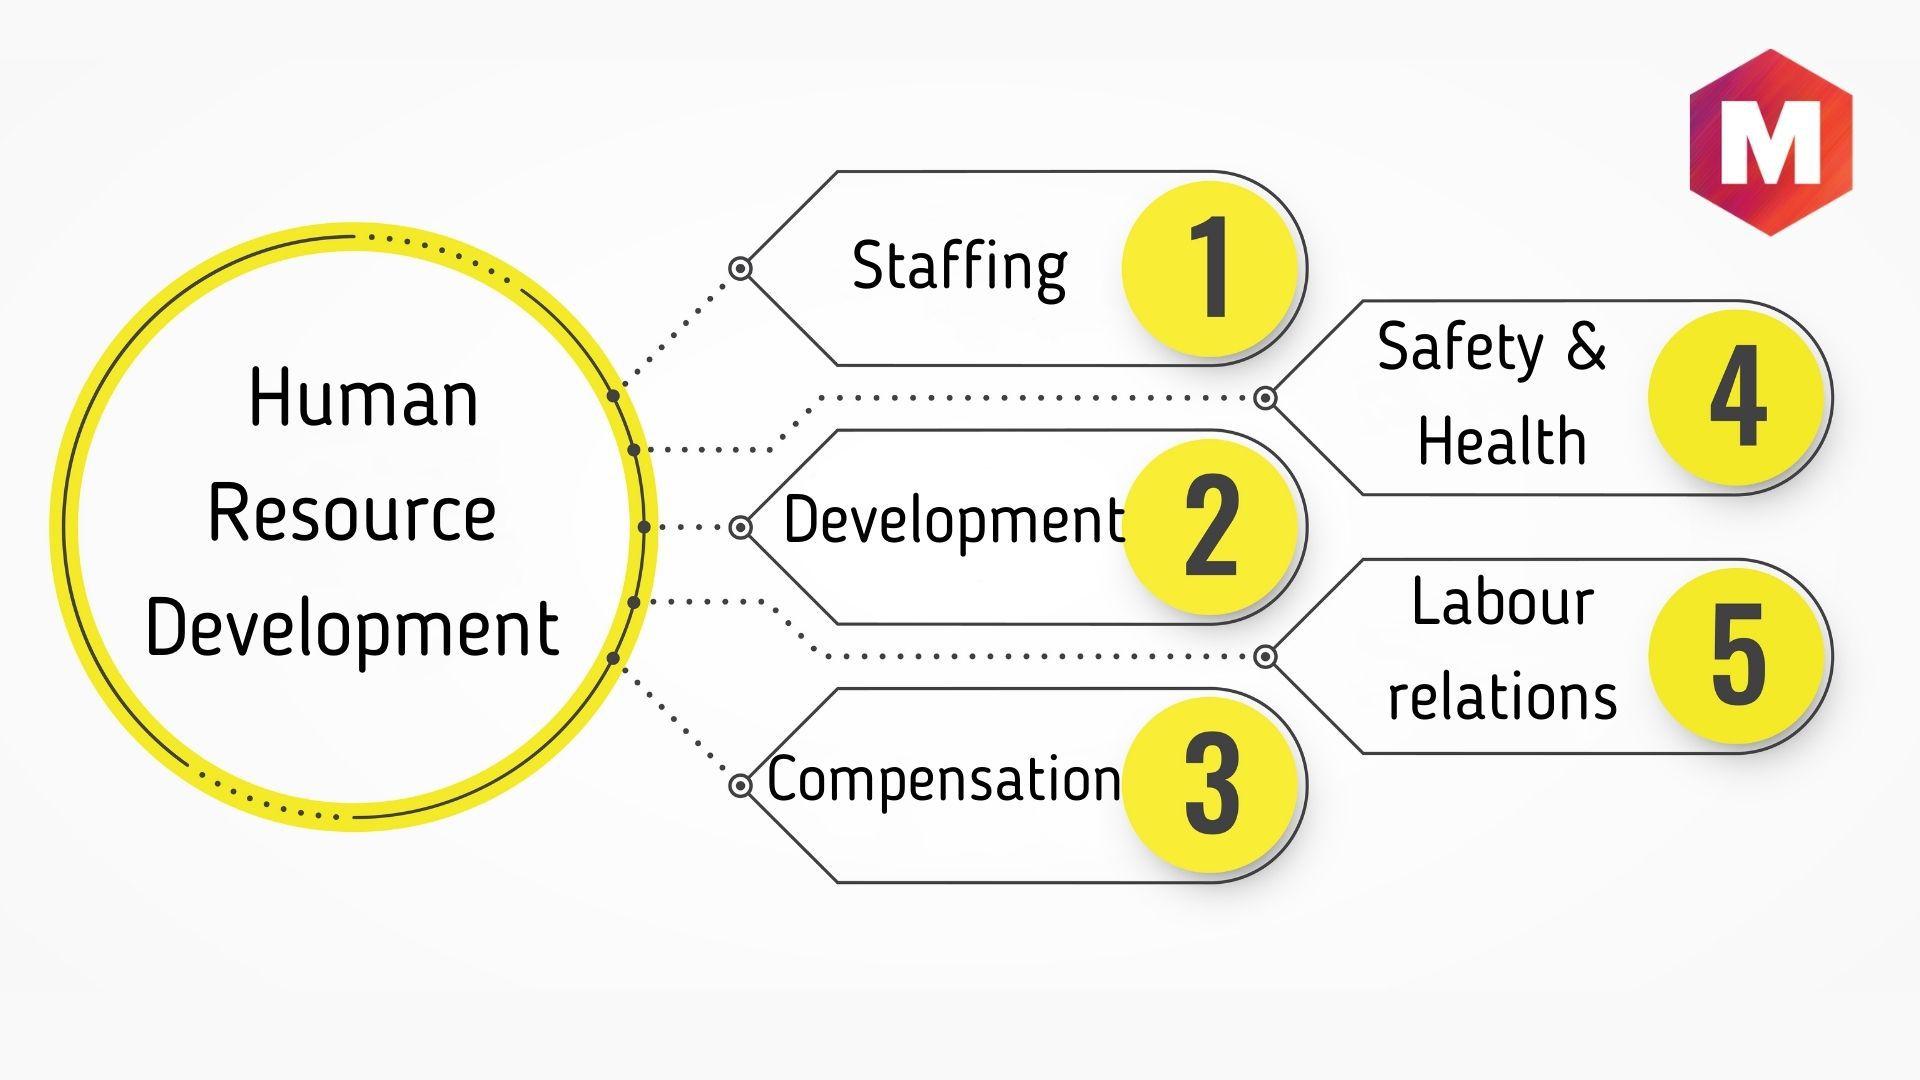 Core Functions of Human Resource Development